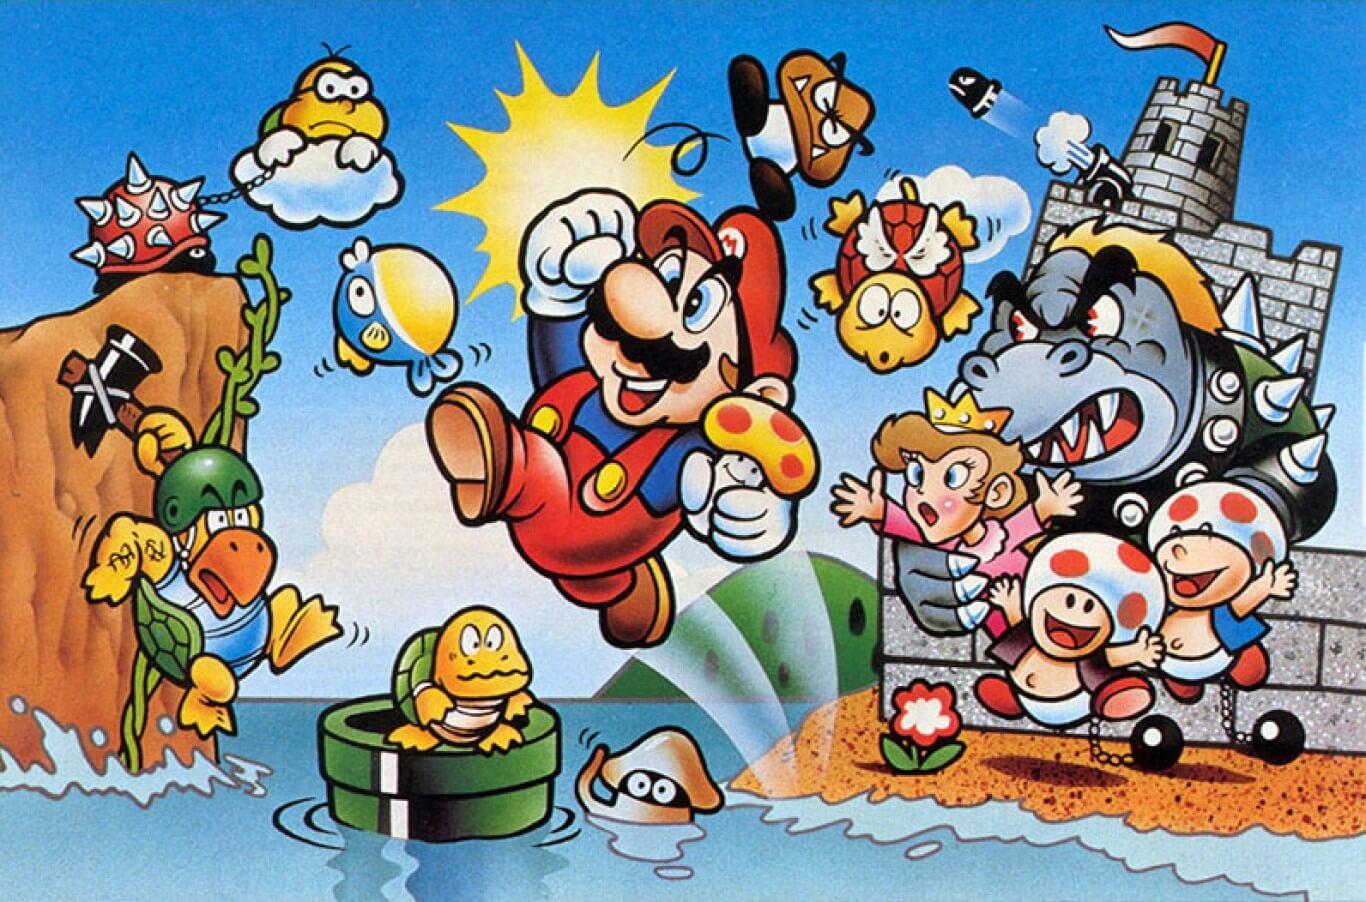 Super Mario Bros Nes Vhs Revival